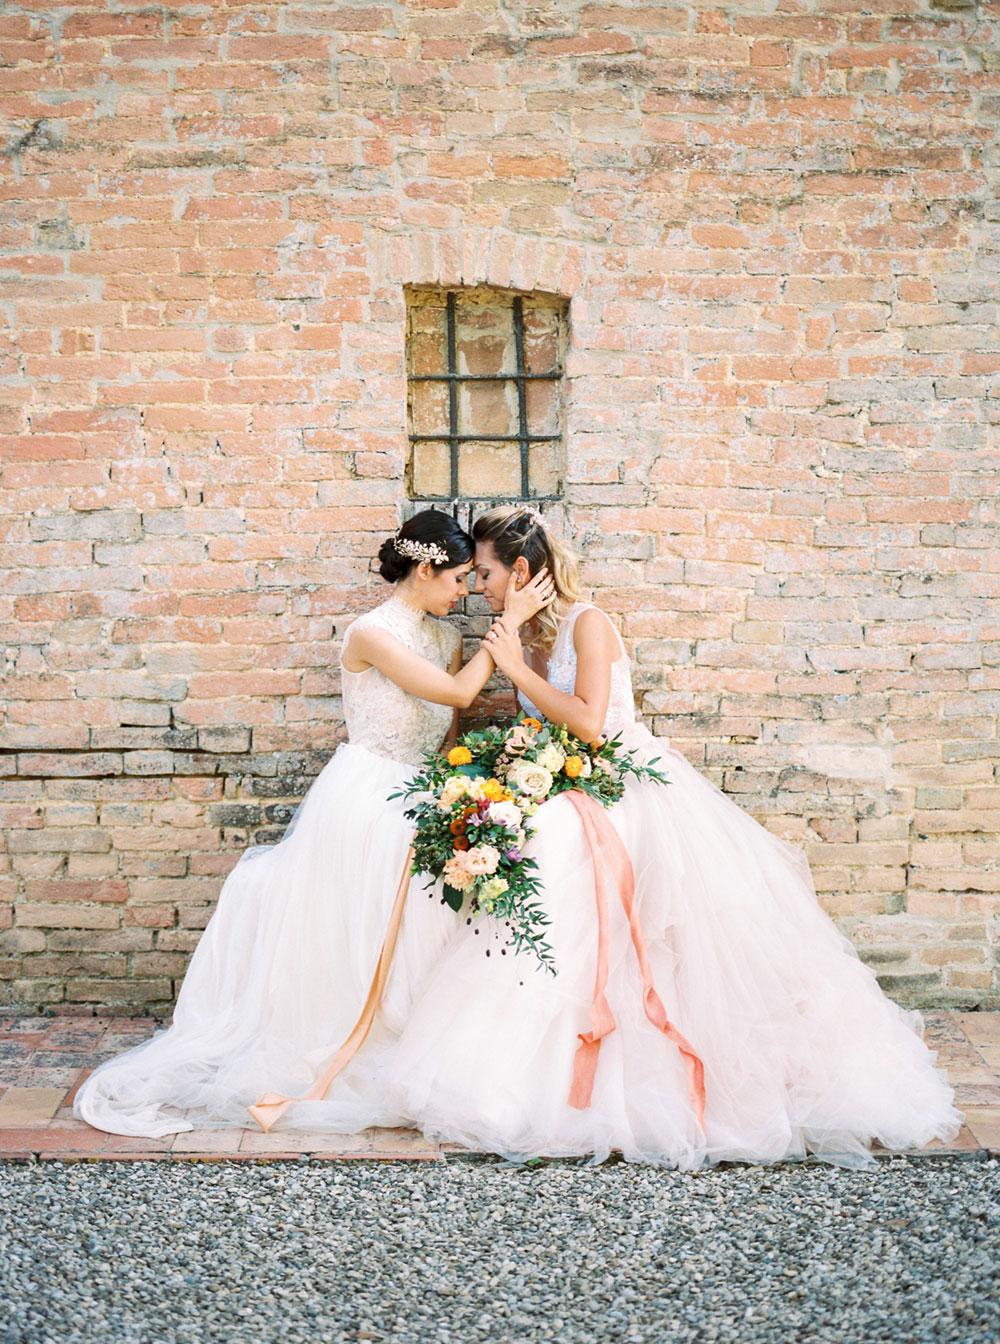 Linari-Tuscany-Elopement-Courtney-Michaela-120